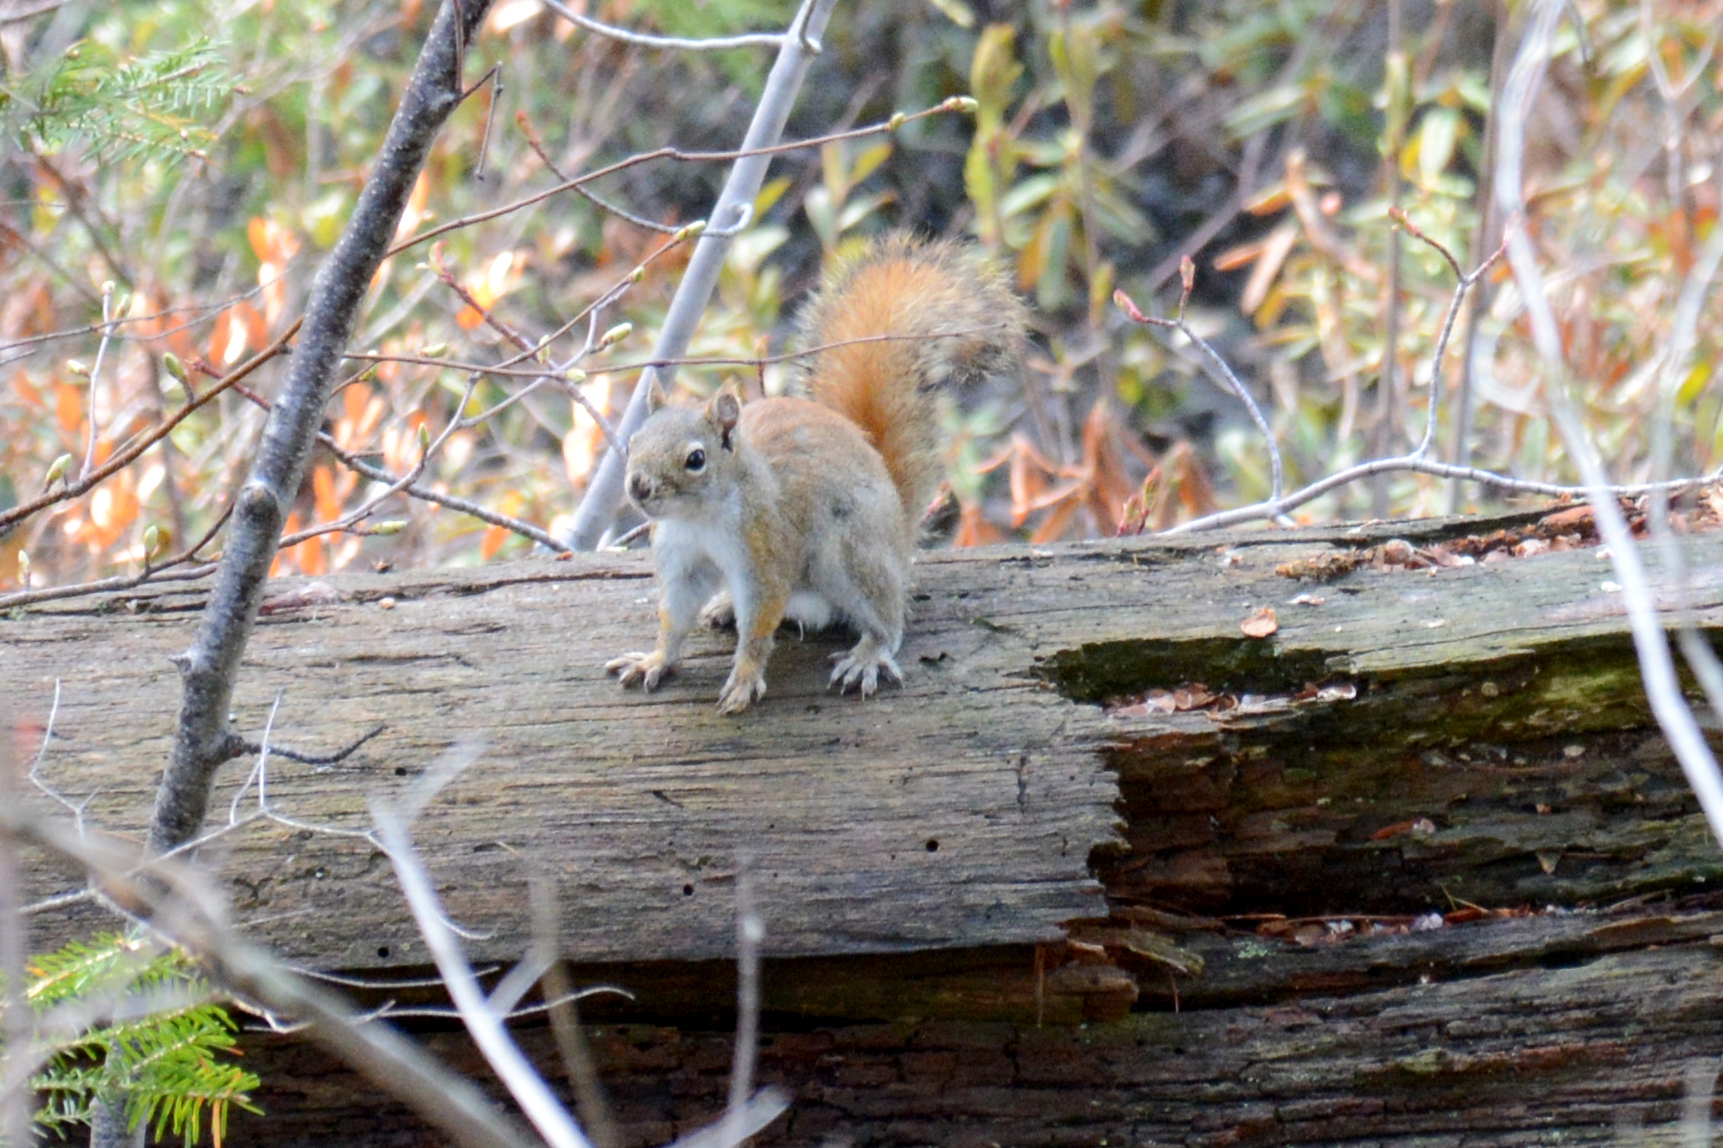 2015-05-16_stocktonisland_squirrel